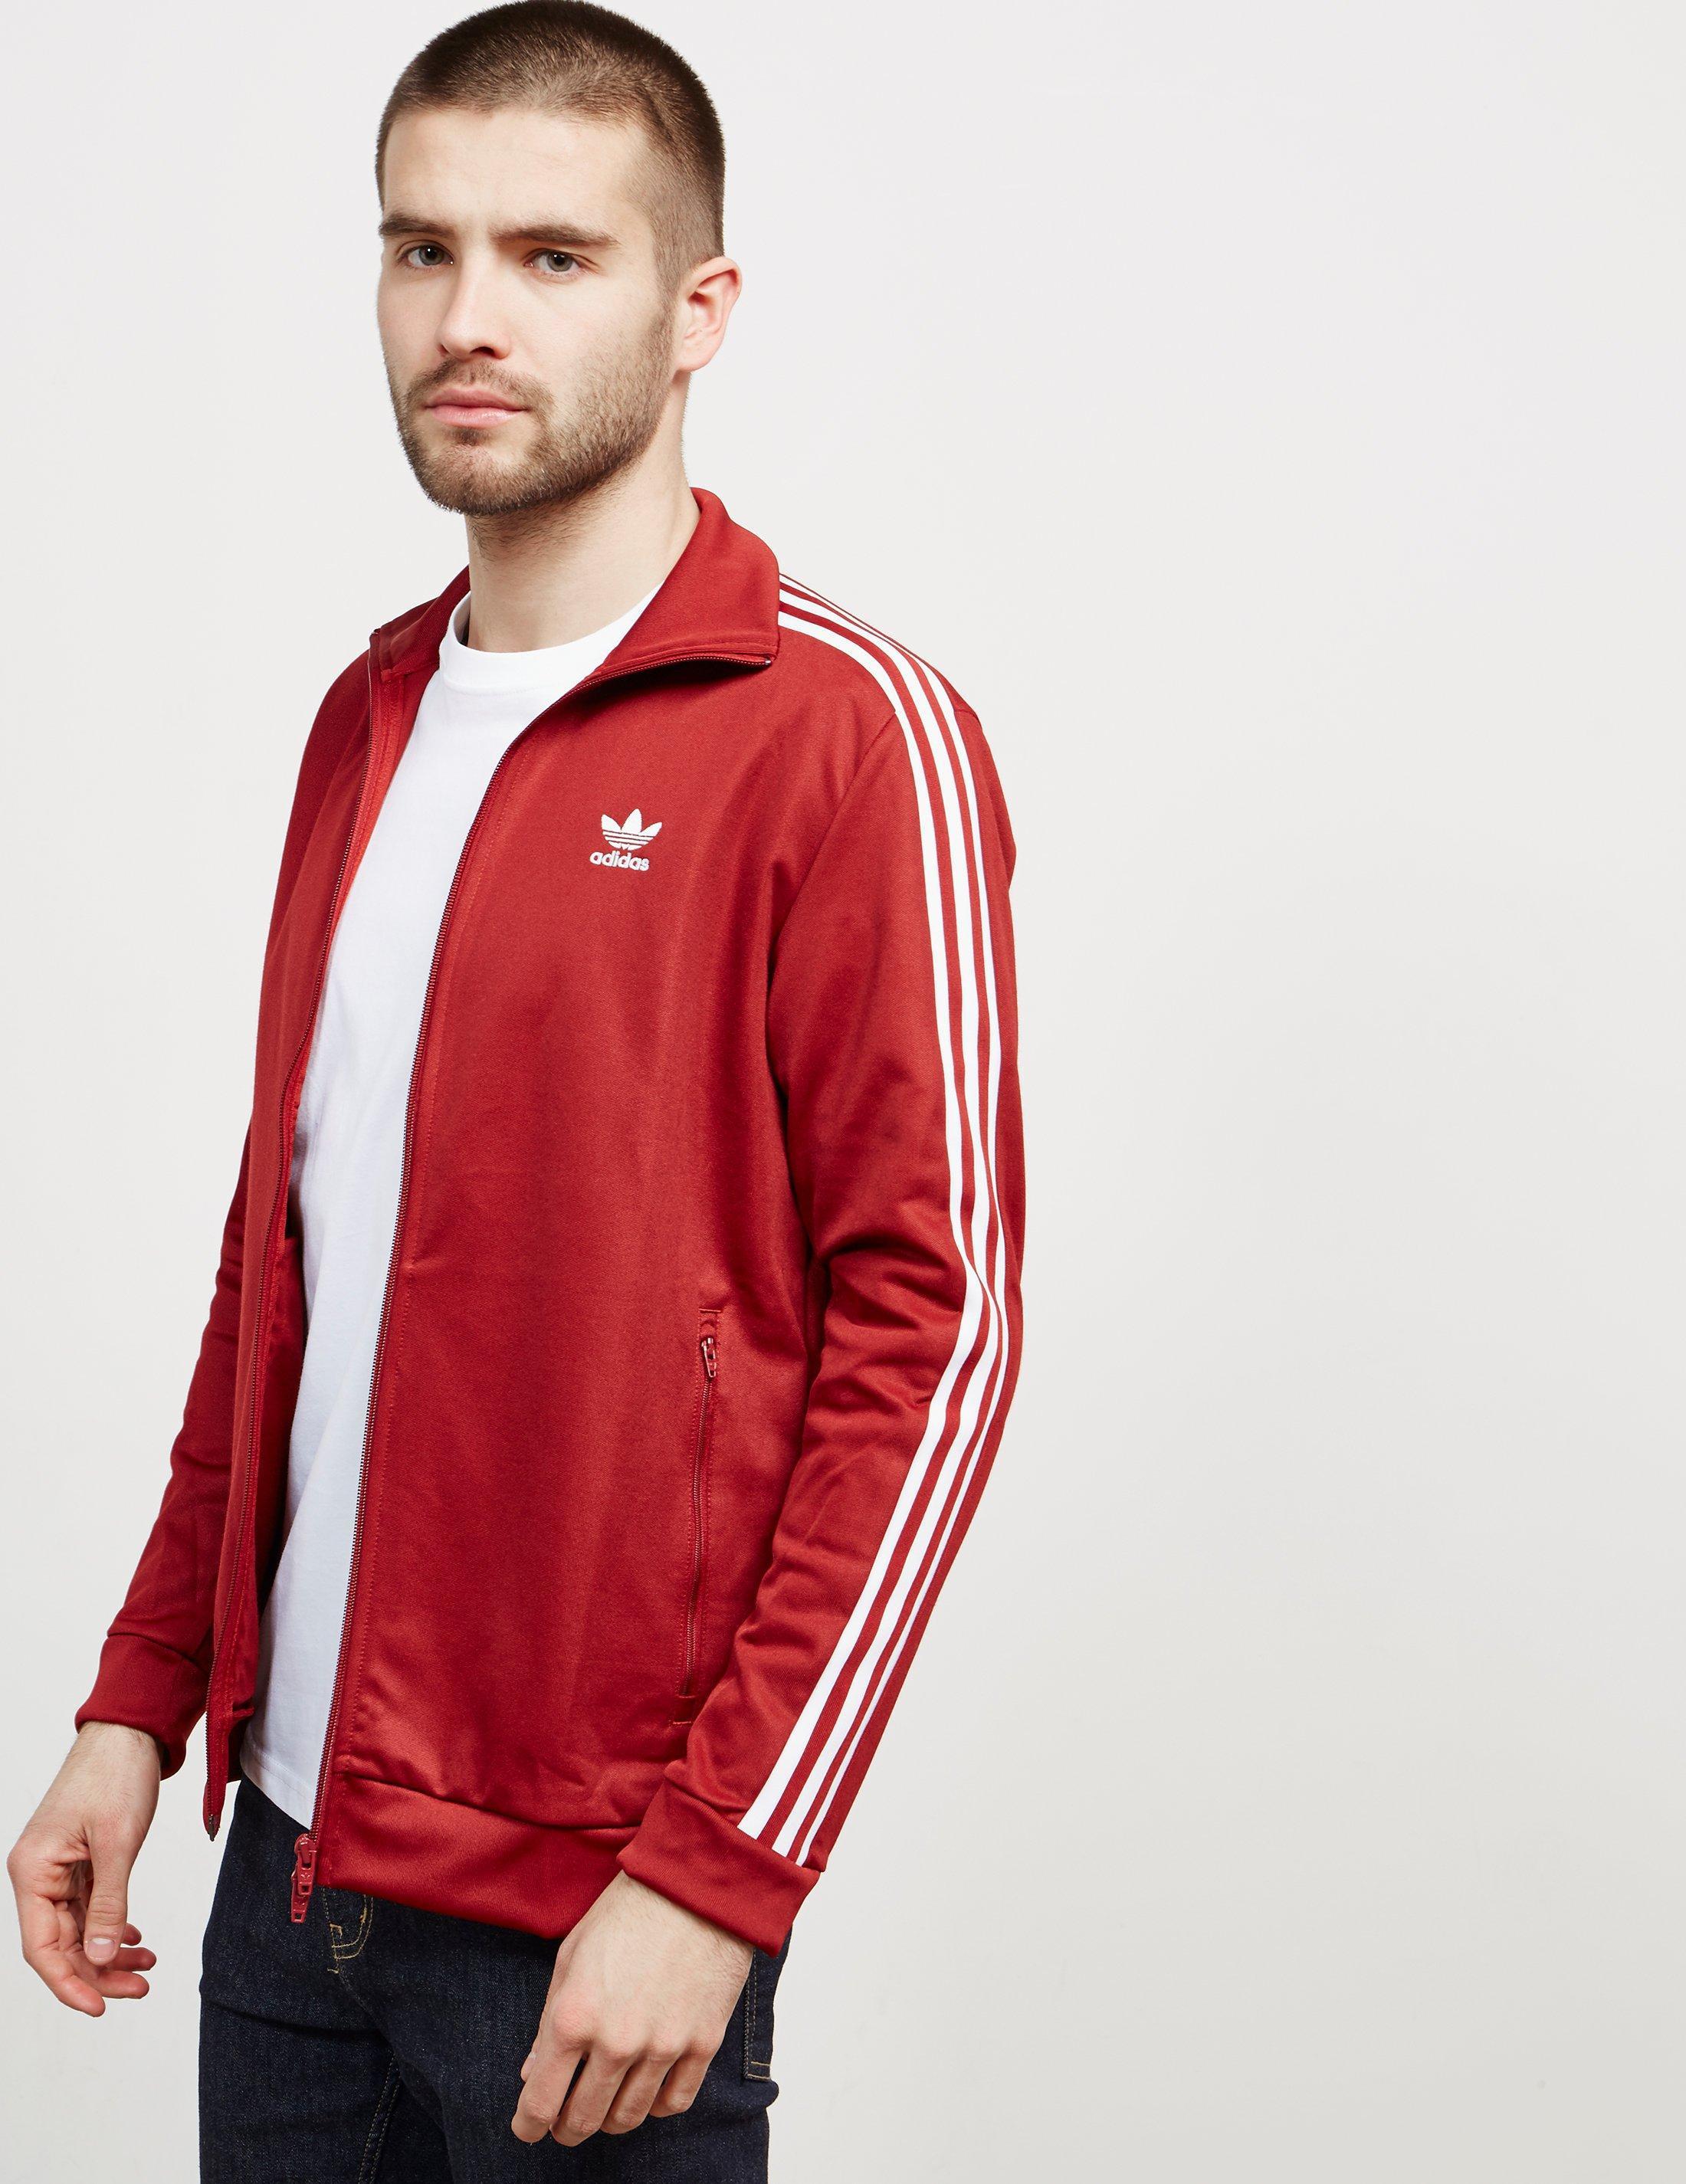 Adidas Originals Mens Beckenbauer Full Zip Track Top Red for men